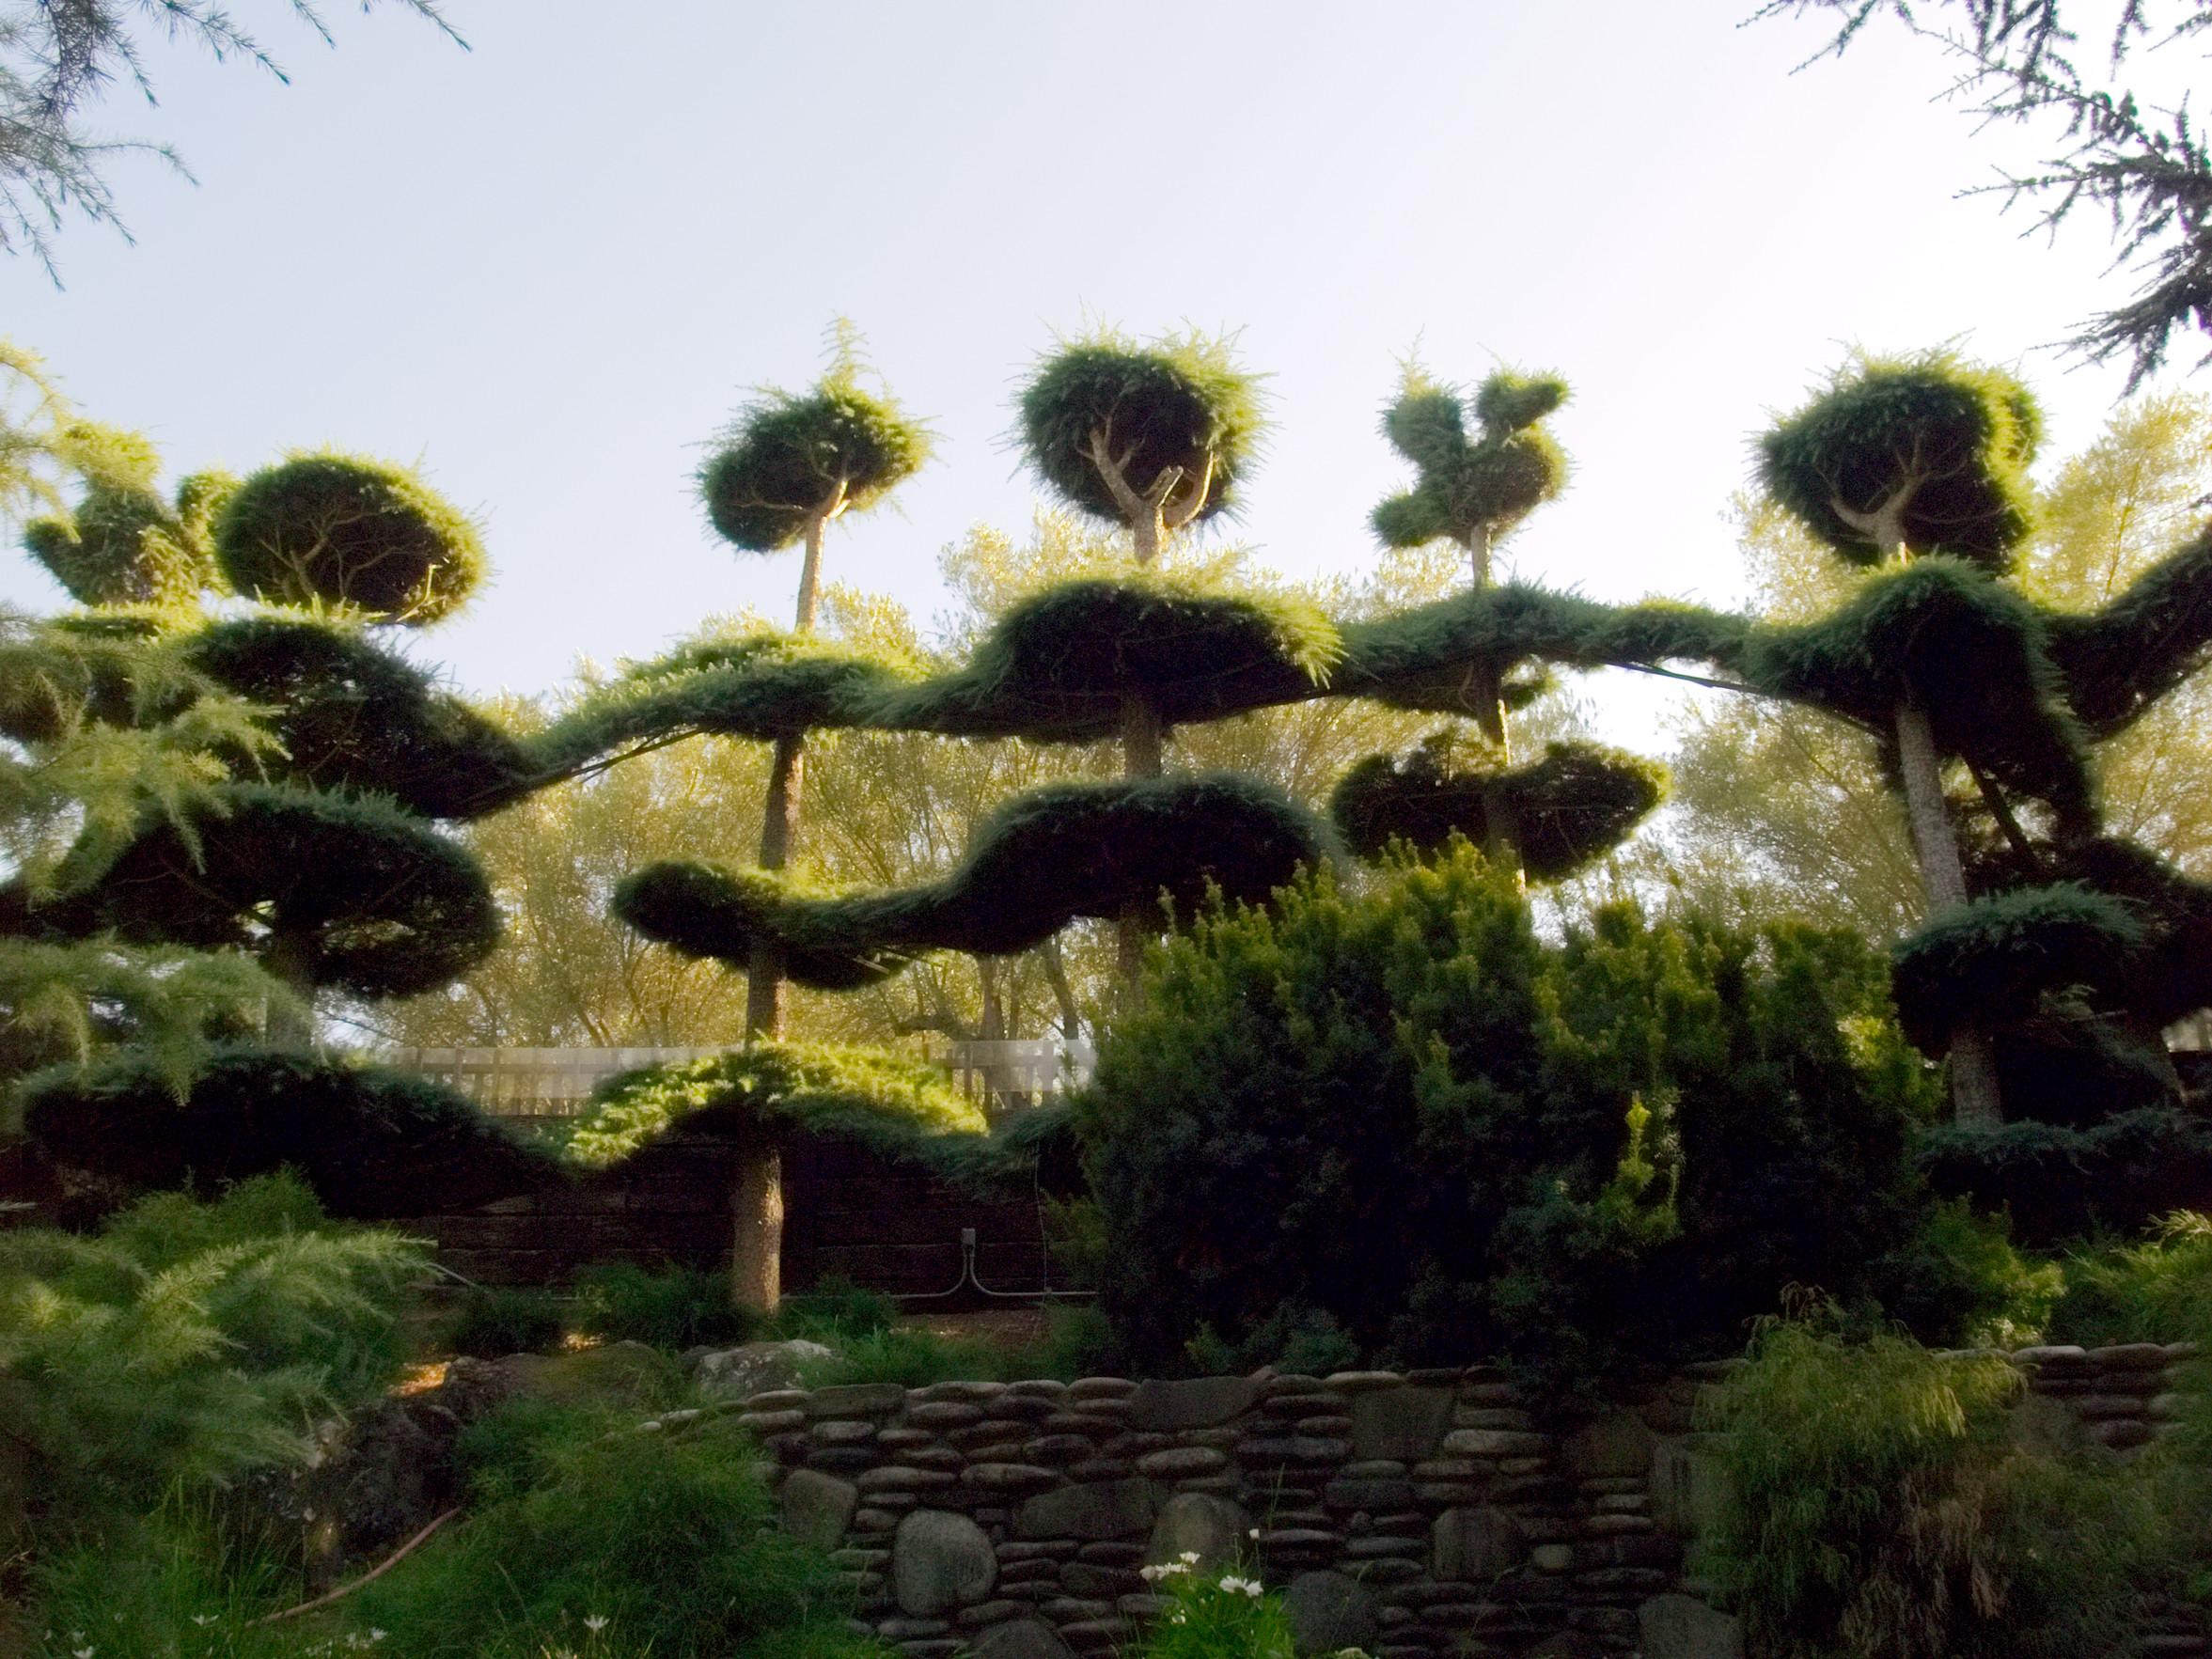 Bonfante Gardens 2006 09 22